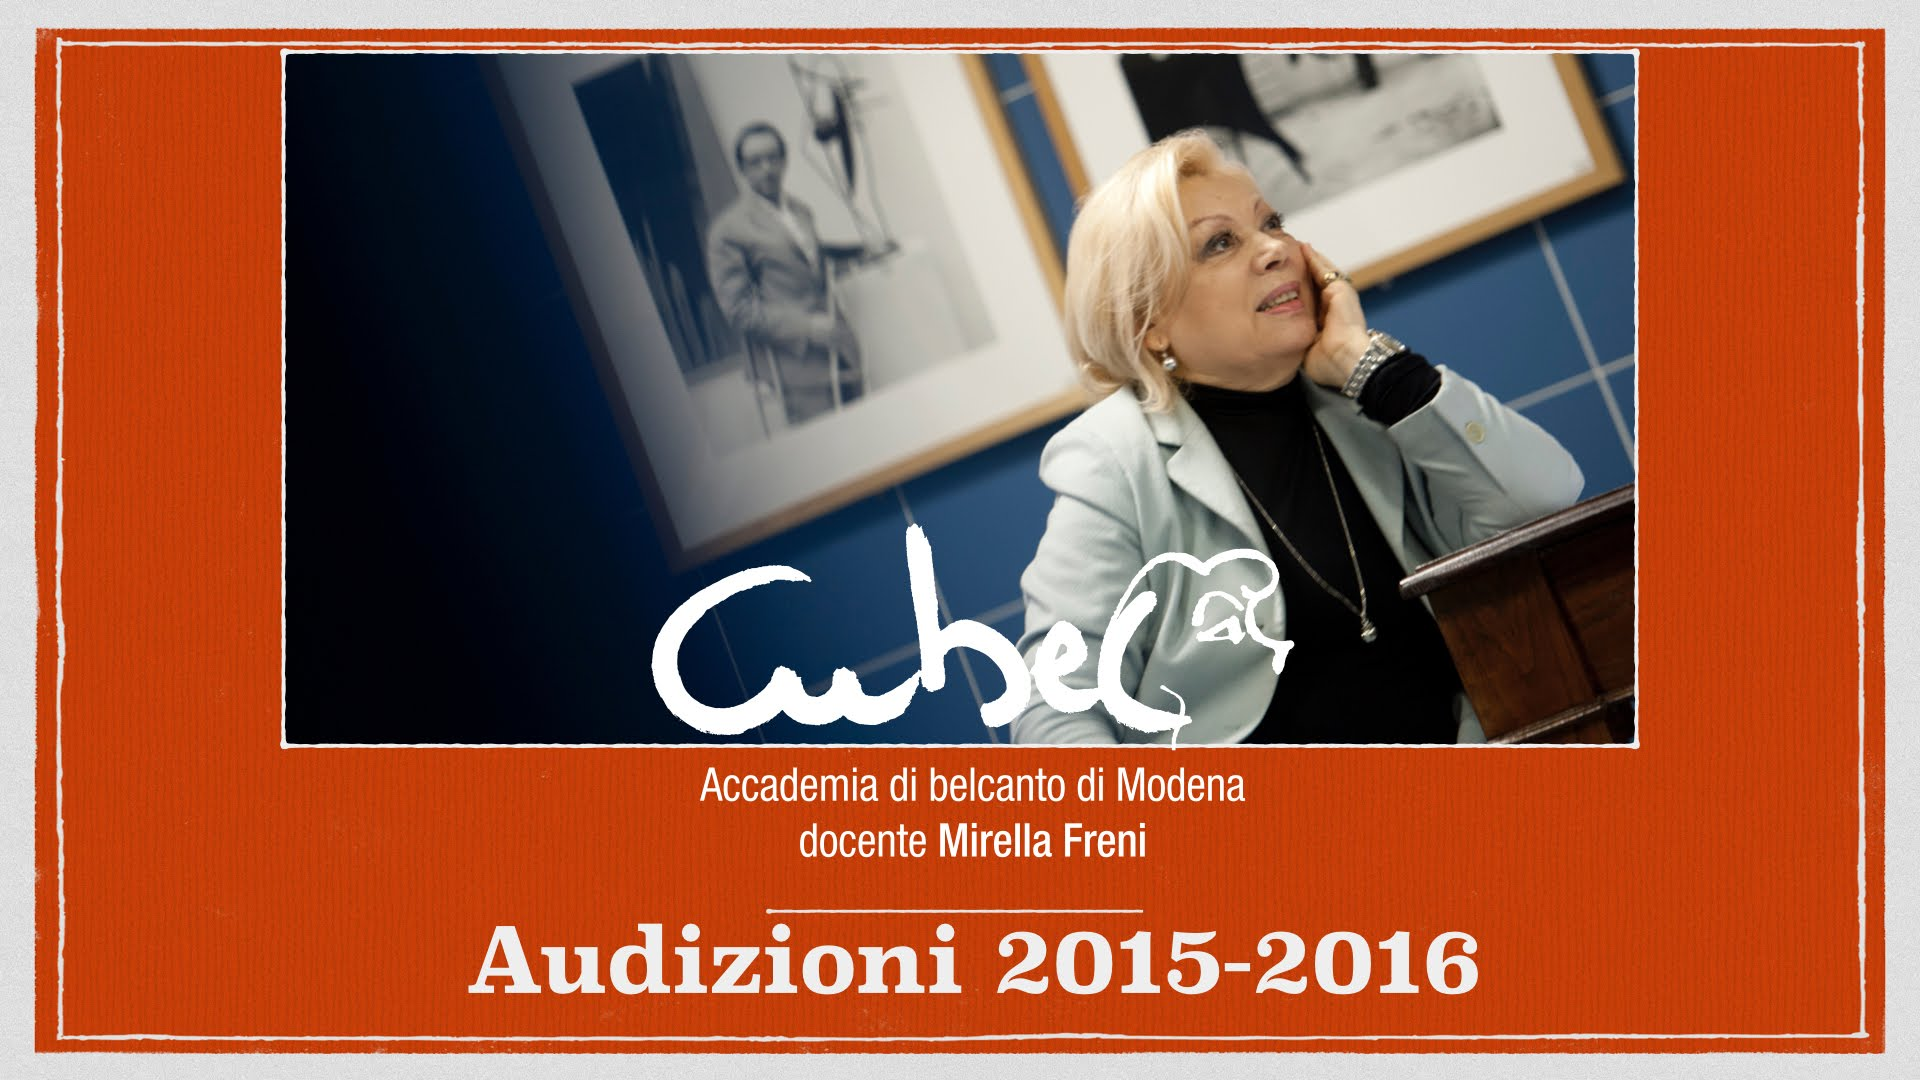 Mirella Freni severs ties with CUBEC